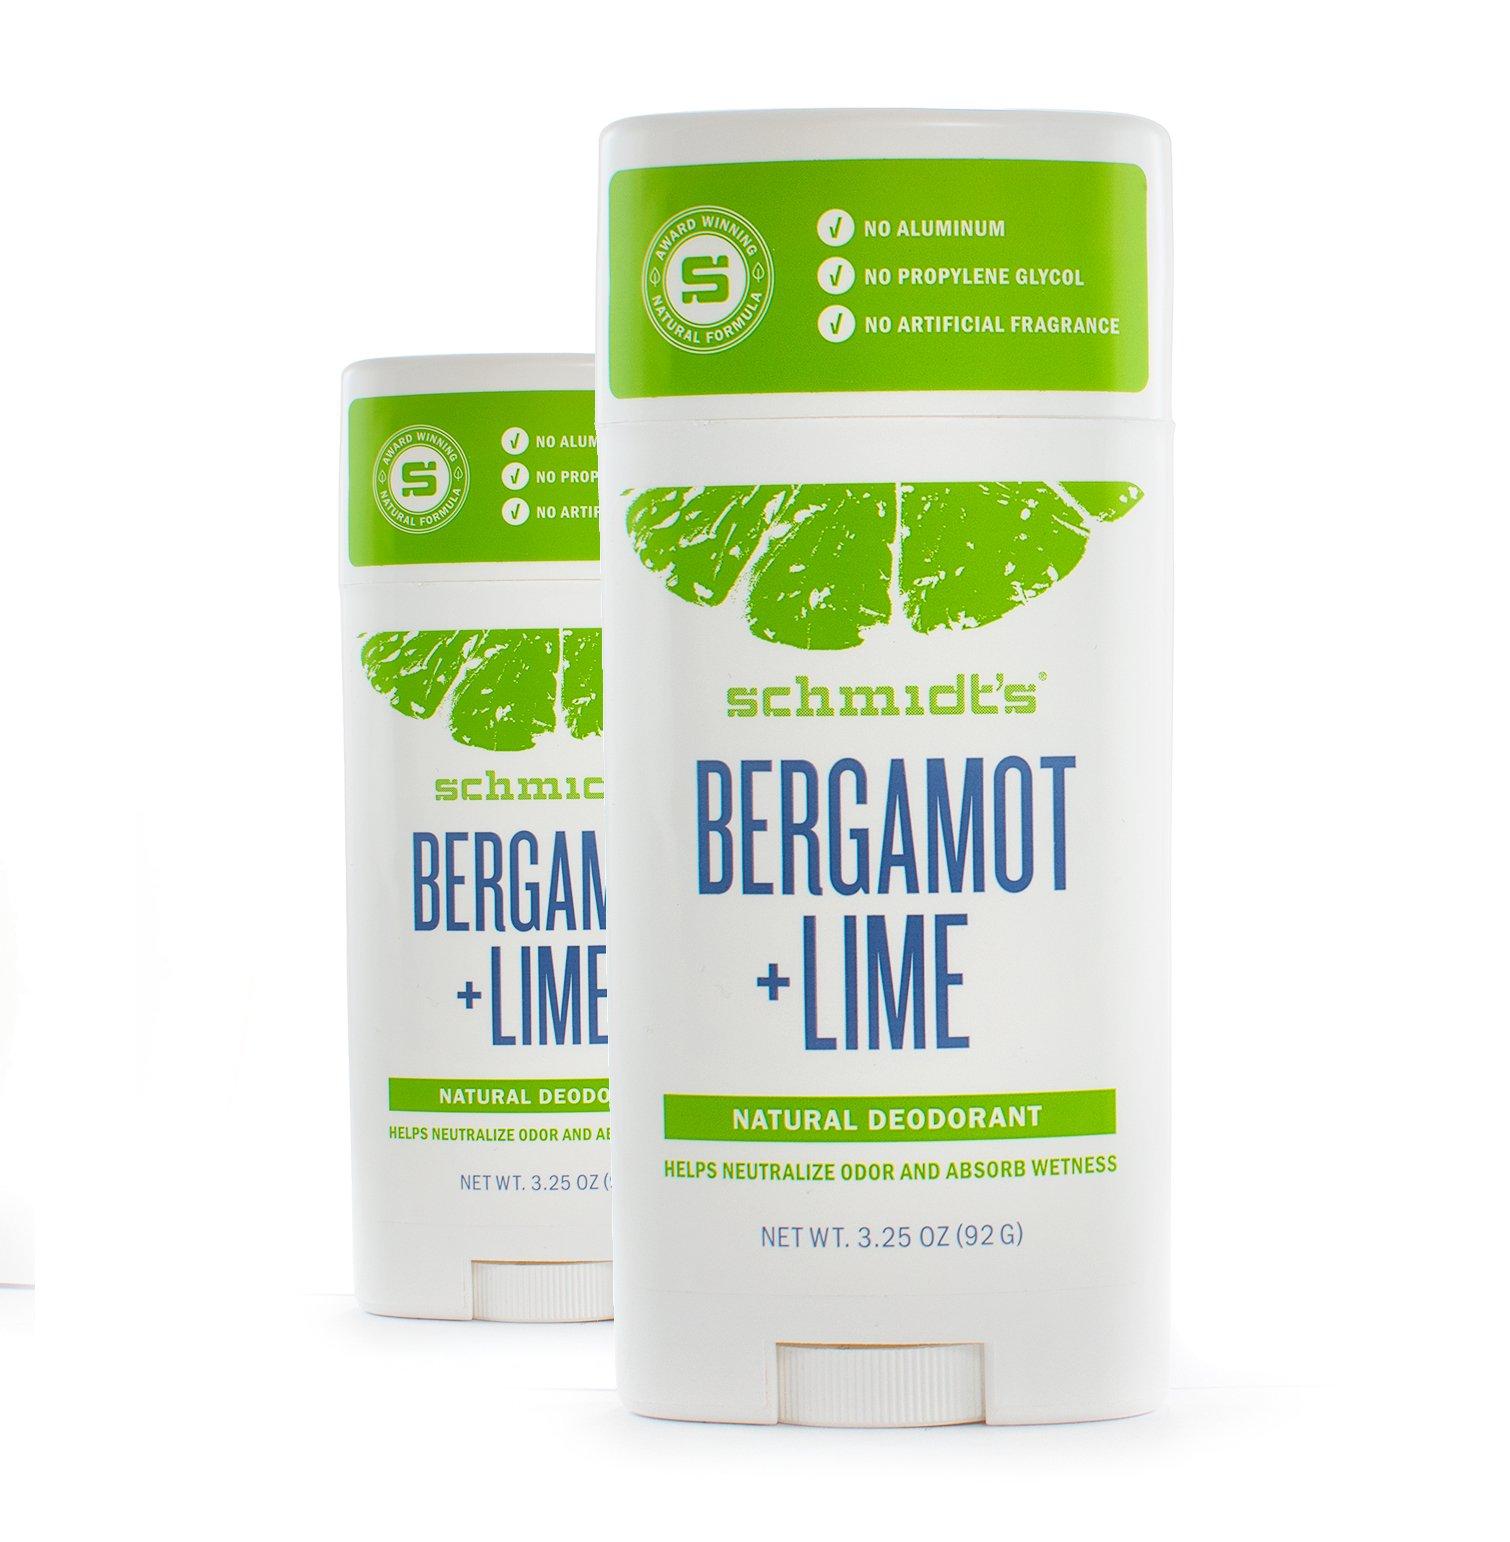 Schmidt's Deodorant, Bergamot + Lime, 3.25 oz (92 g) - 2pc